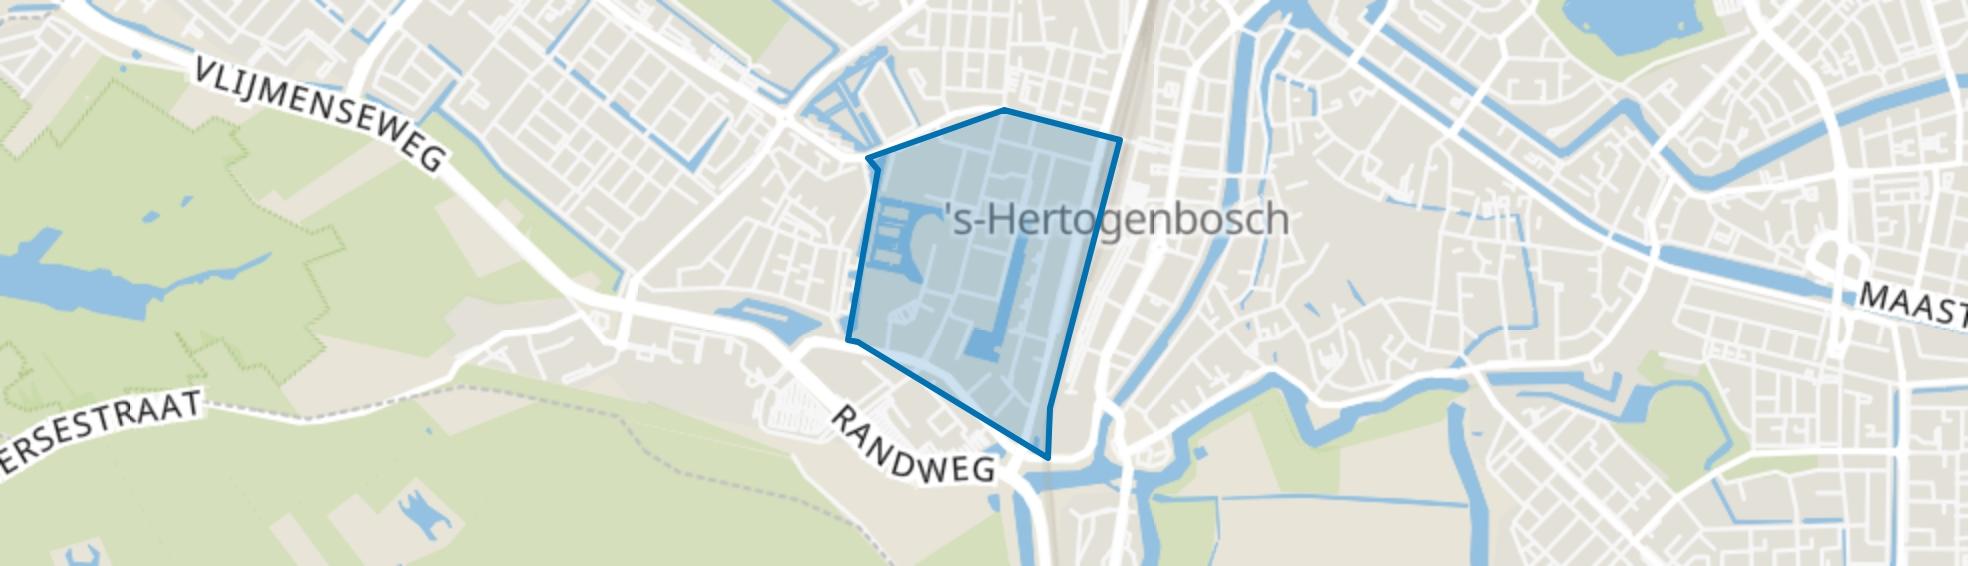 Paleiskwartier, Den Bosch map